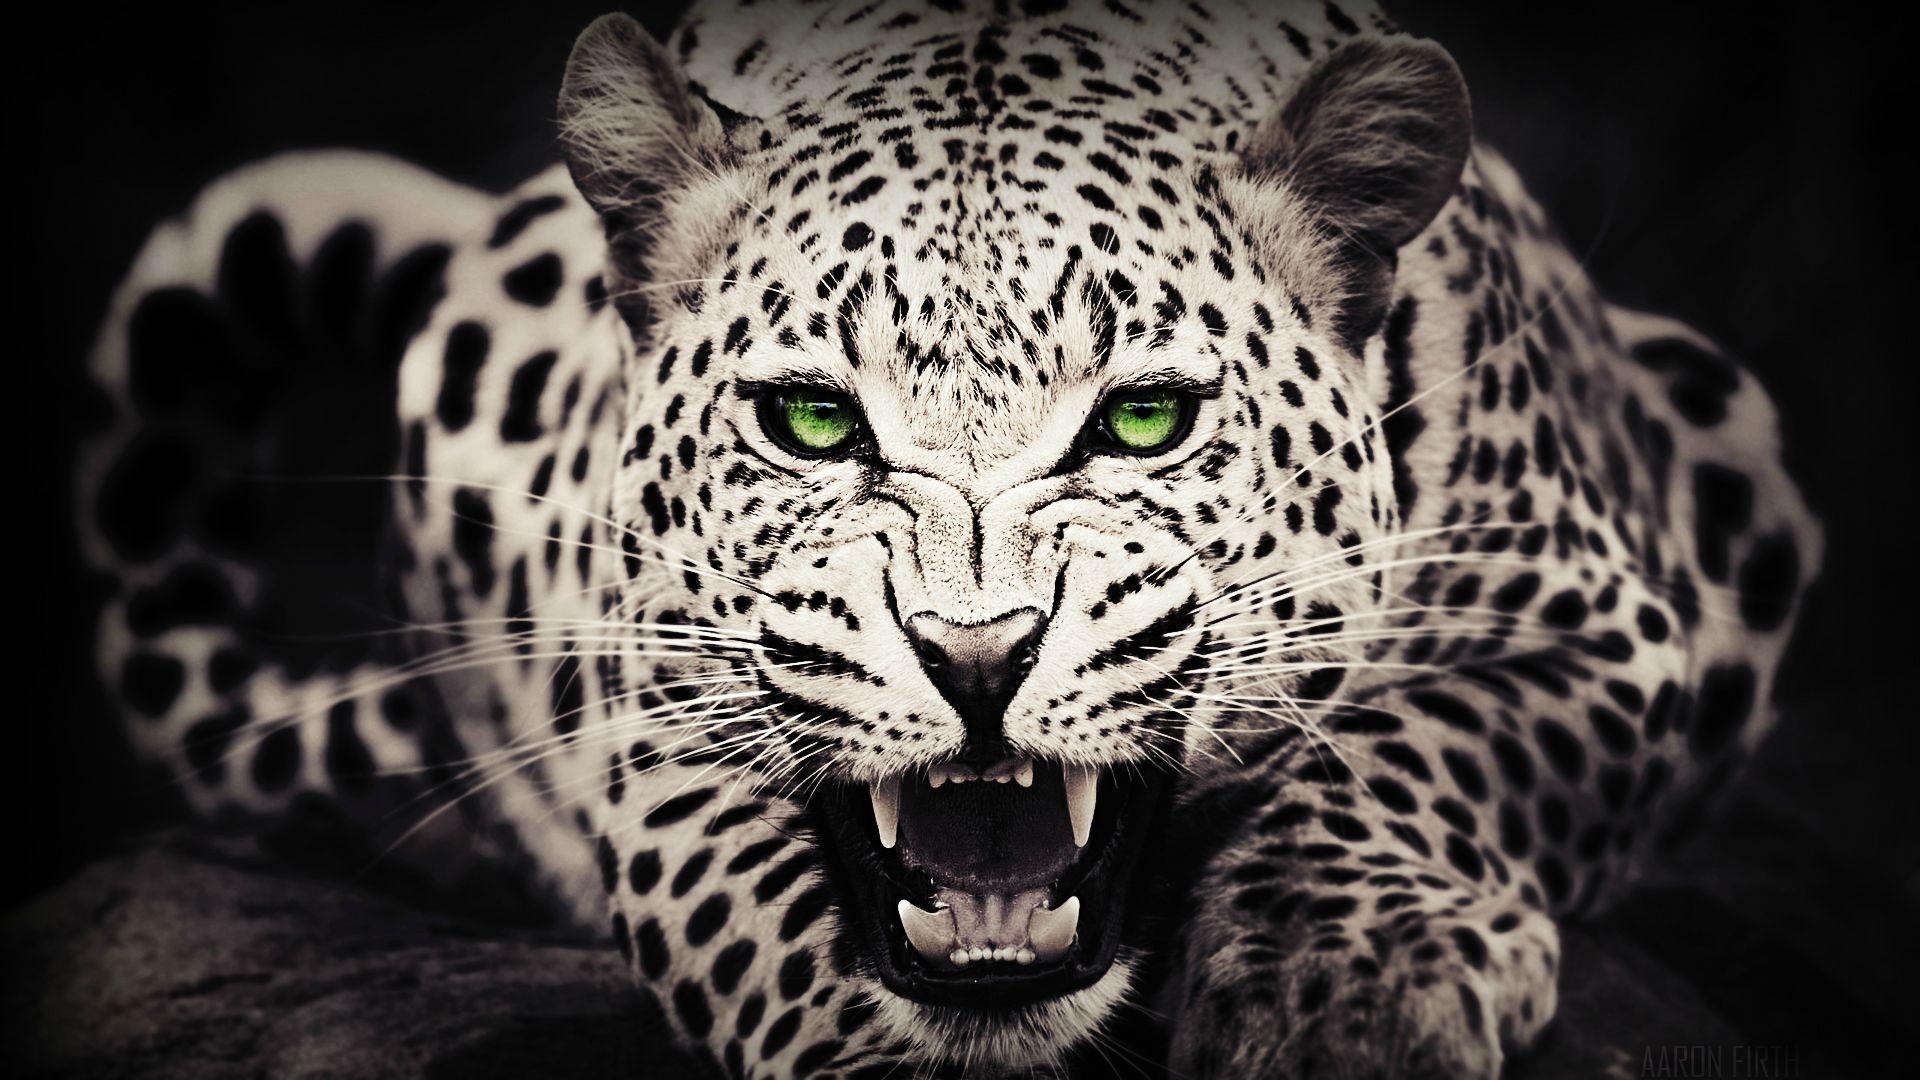 Res: 1920x1080, Black Cheetah Wallpapers - Wallpaper Cave